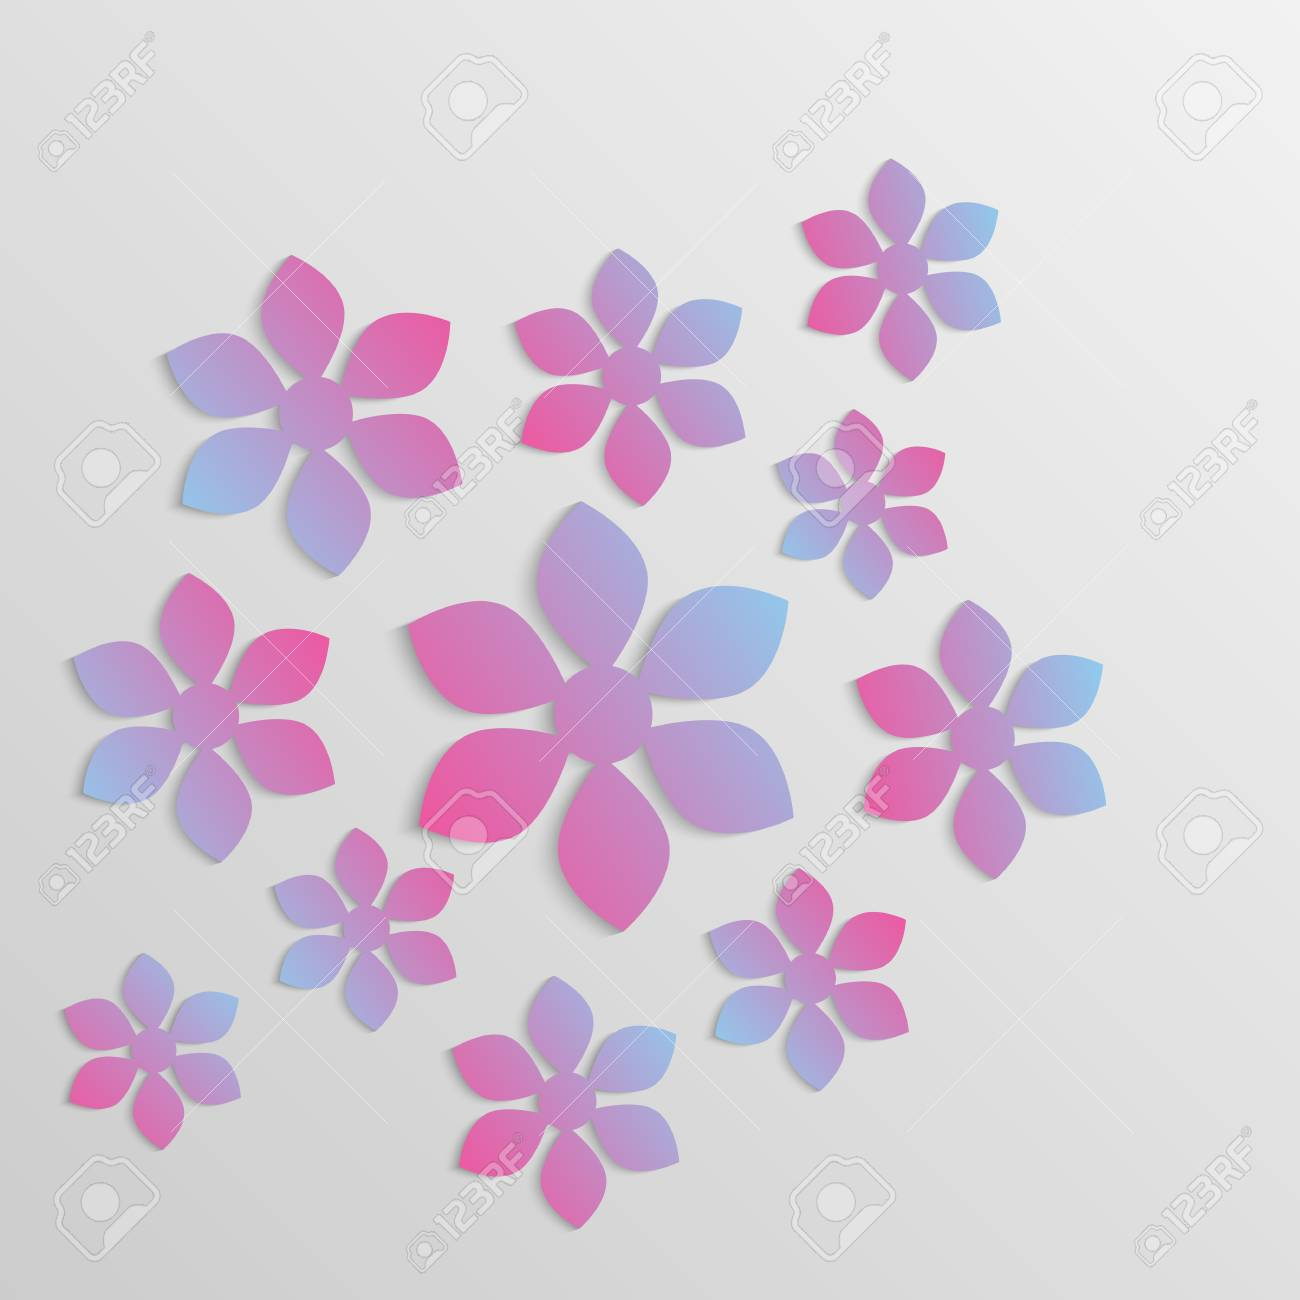 Vector Paper Flower Origami Lizenzfrei Nutzbare Vektorgrafiken